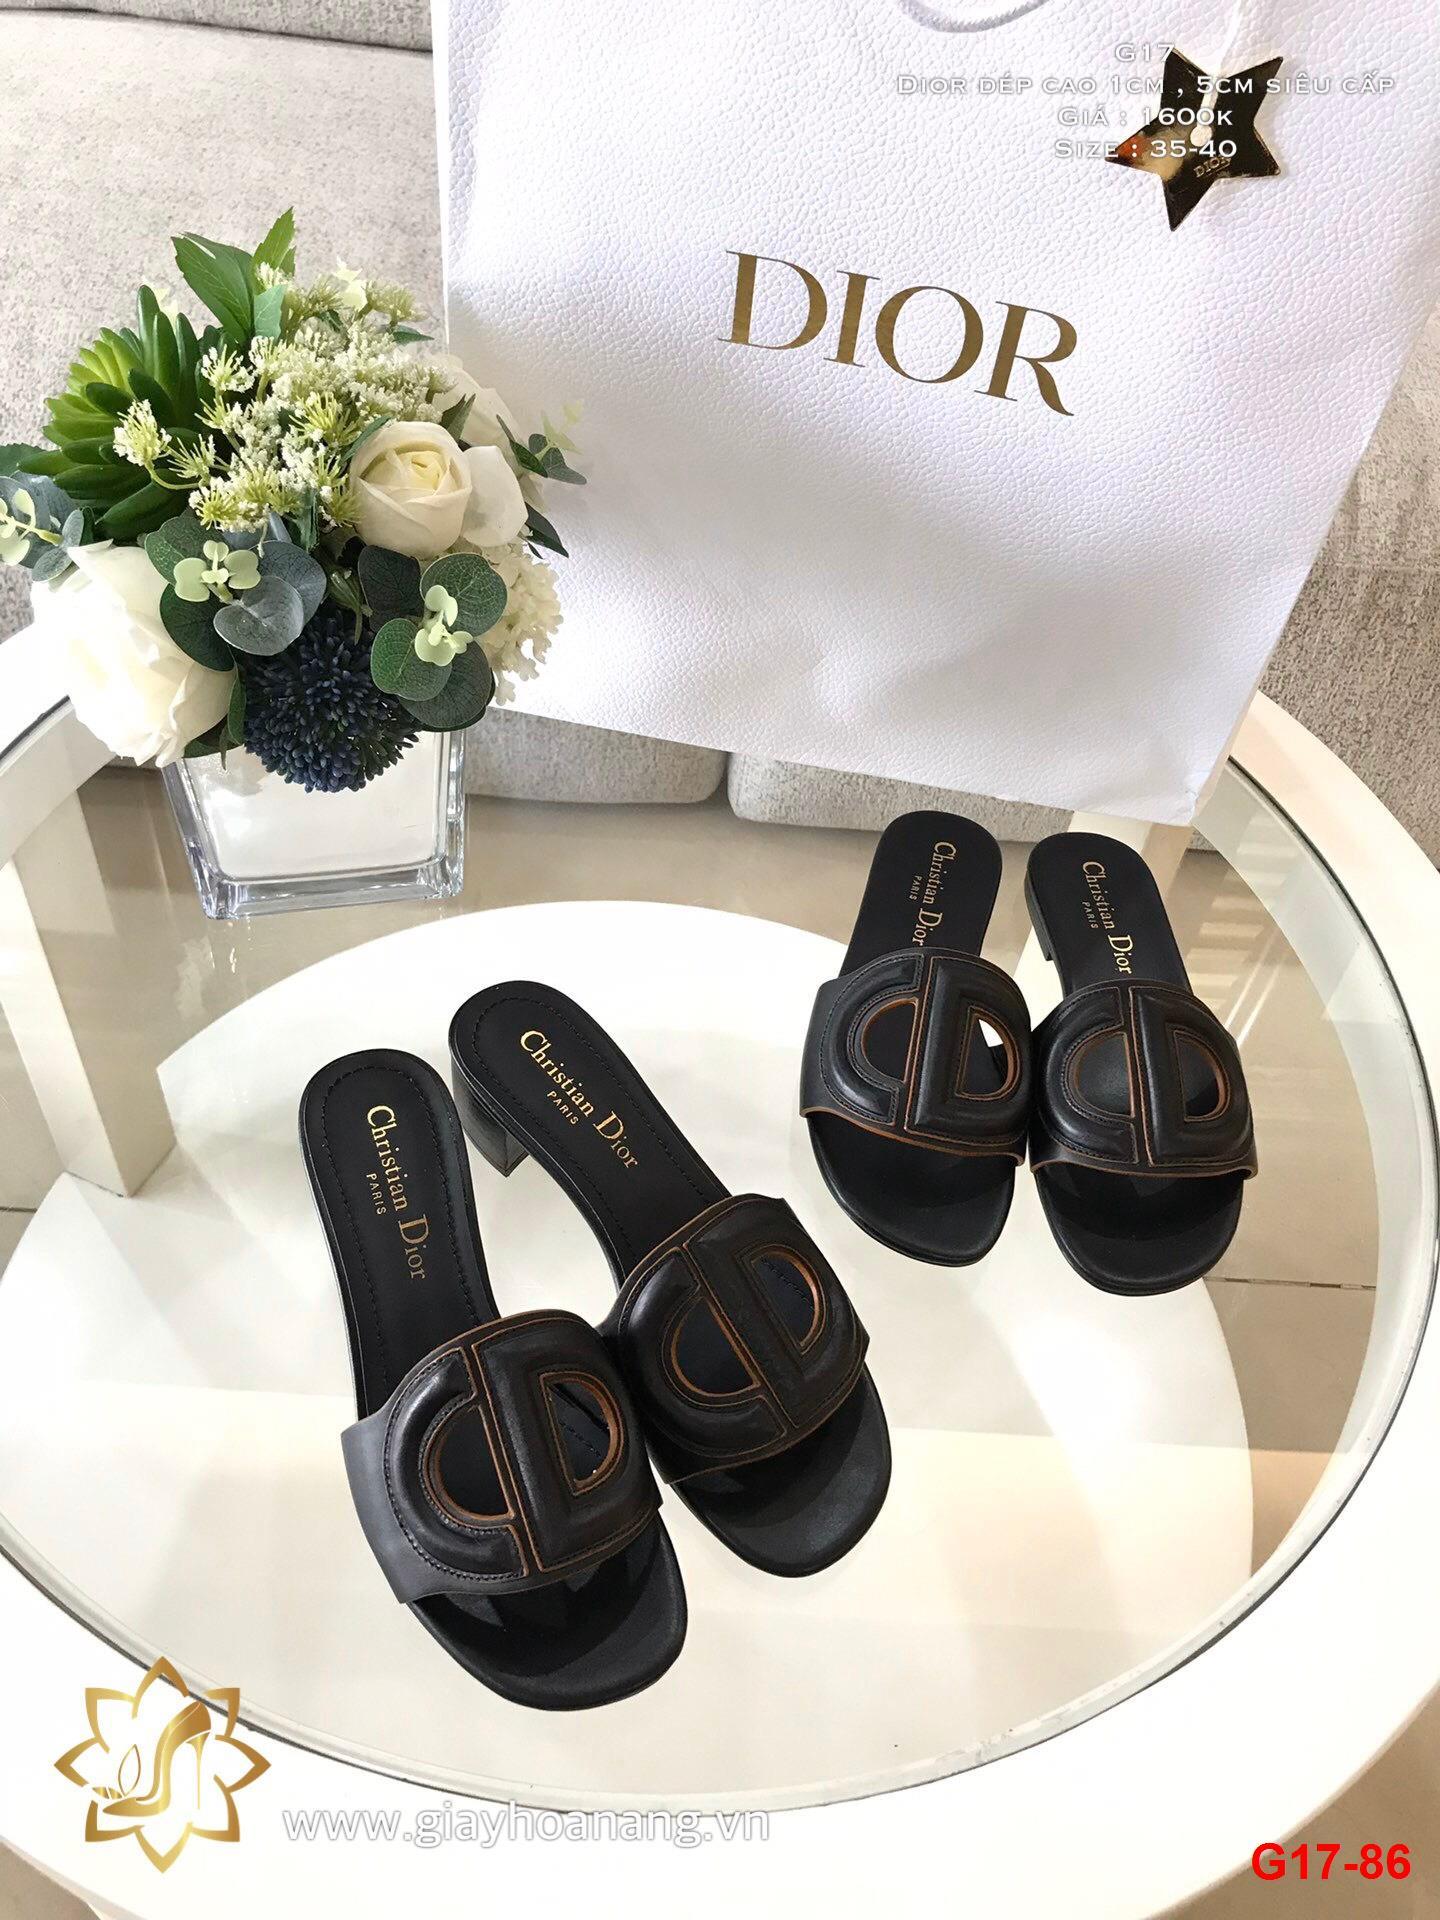 G17-86 Dior dép cao 1cm , 5cm siêu cấp